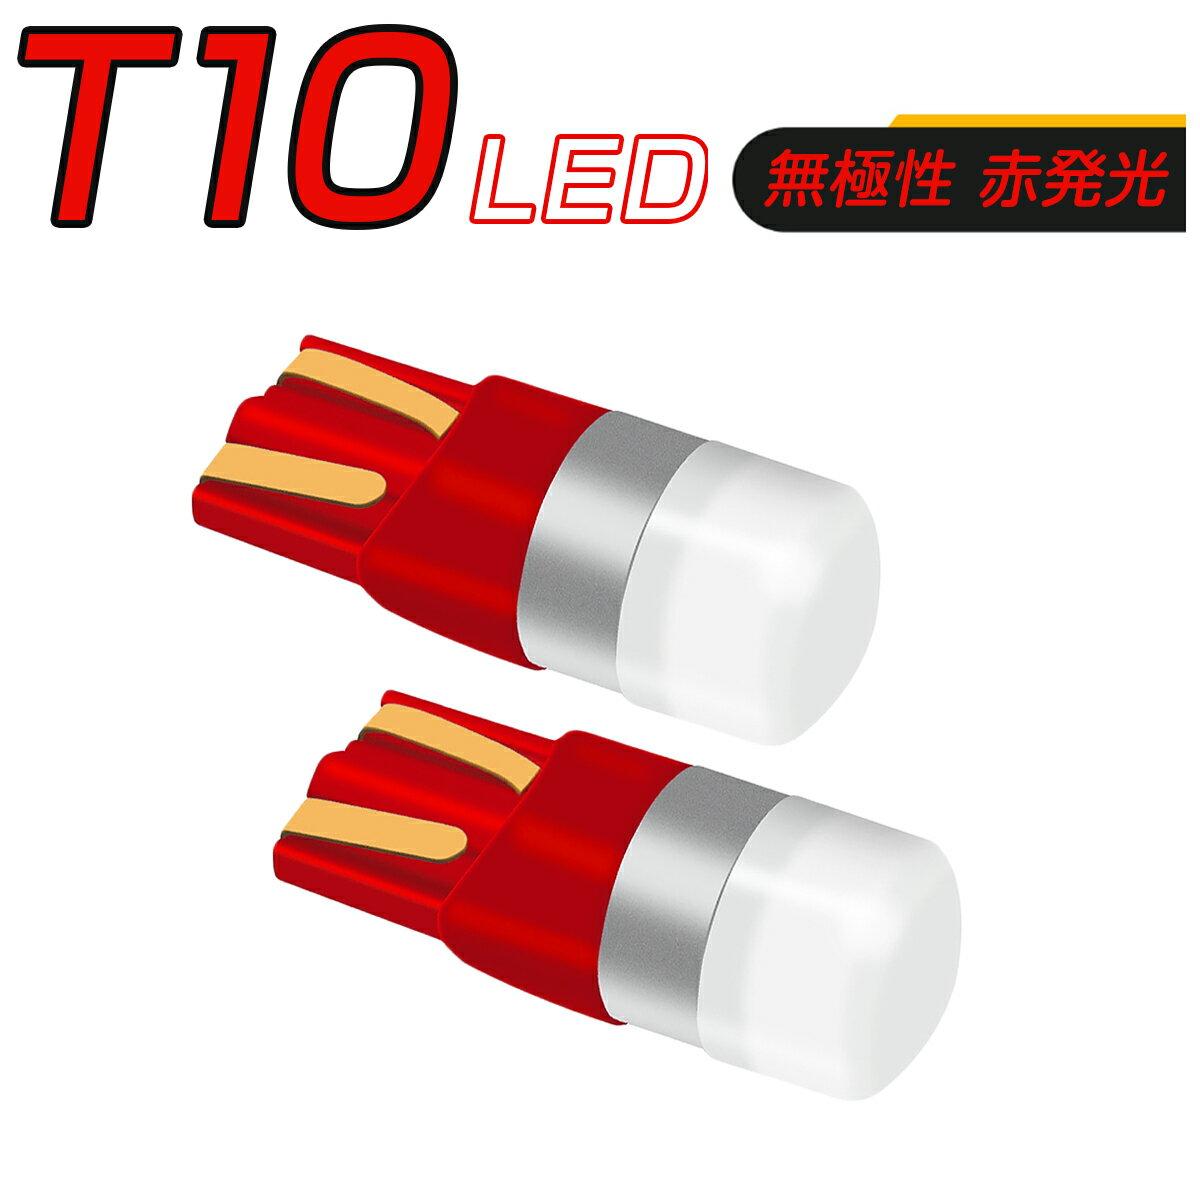 TOYOTA カローラ アクシオ(minor後) H24.5〜H27.2 NZE/NRE16# ブレーキテール[T10]赤色 LED 赤 T10 T13 T15 T16 キャンセラー付き 12V/24V 無極性 2個セット SDM便送料無料 3ヶ月保証 K&M